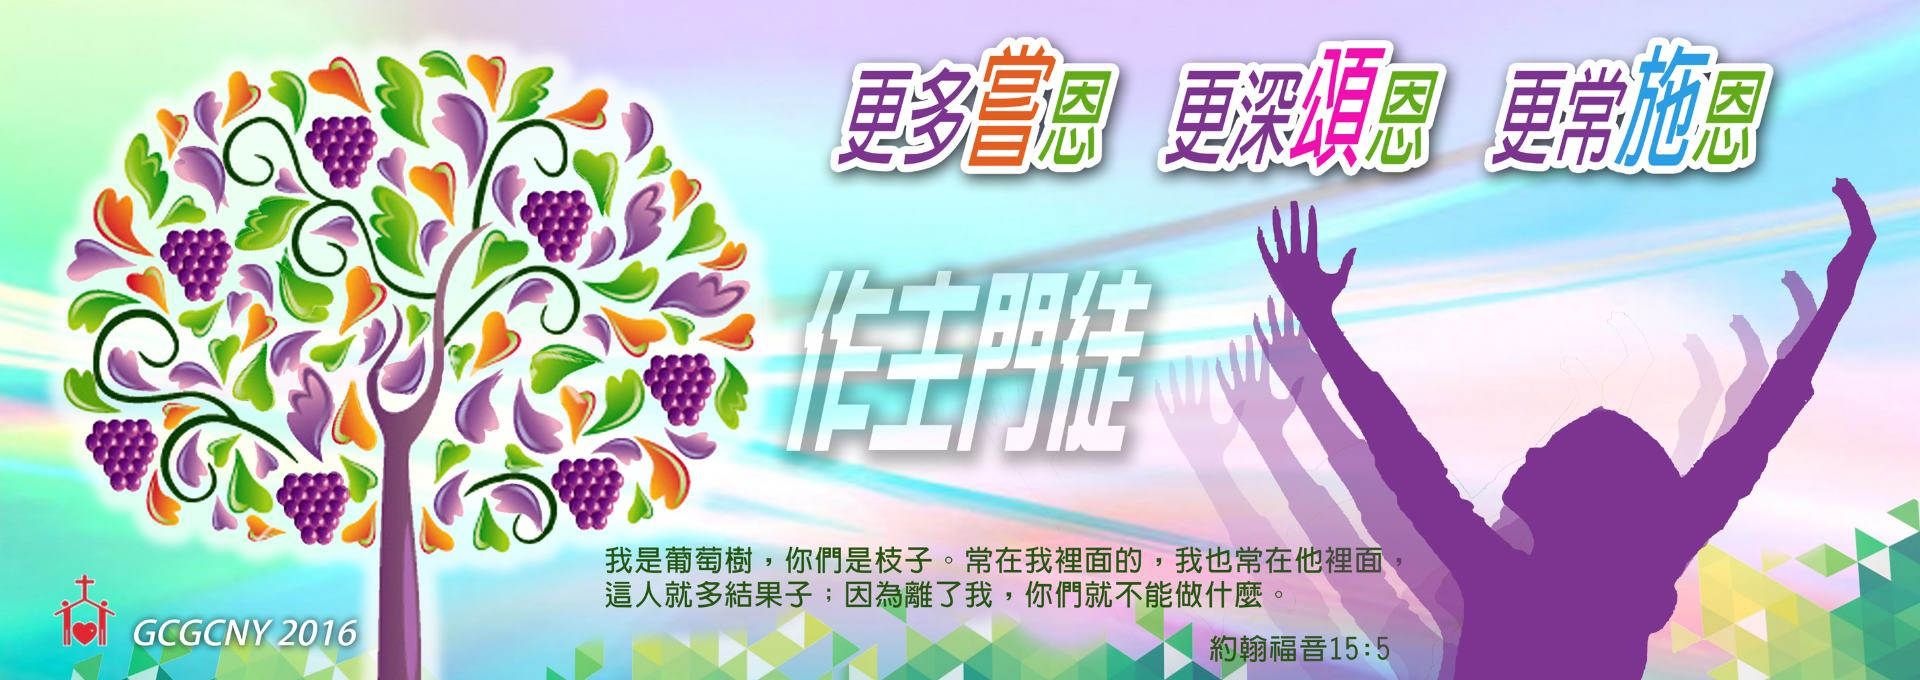 web banner 2016